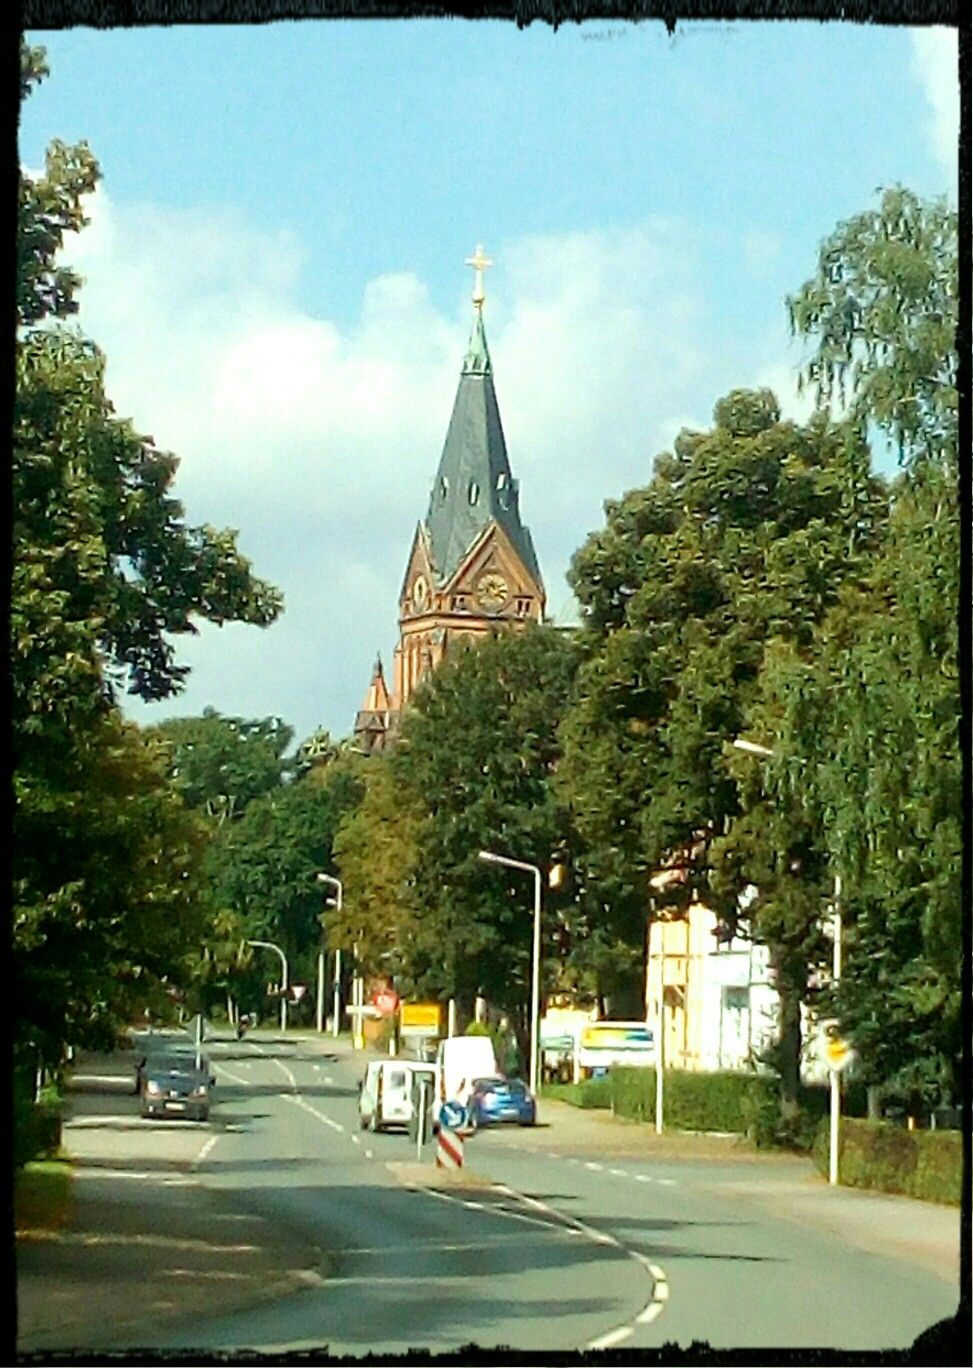 Moritzkirche in Zwickau